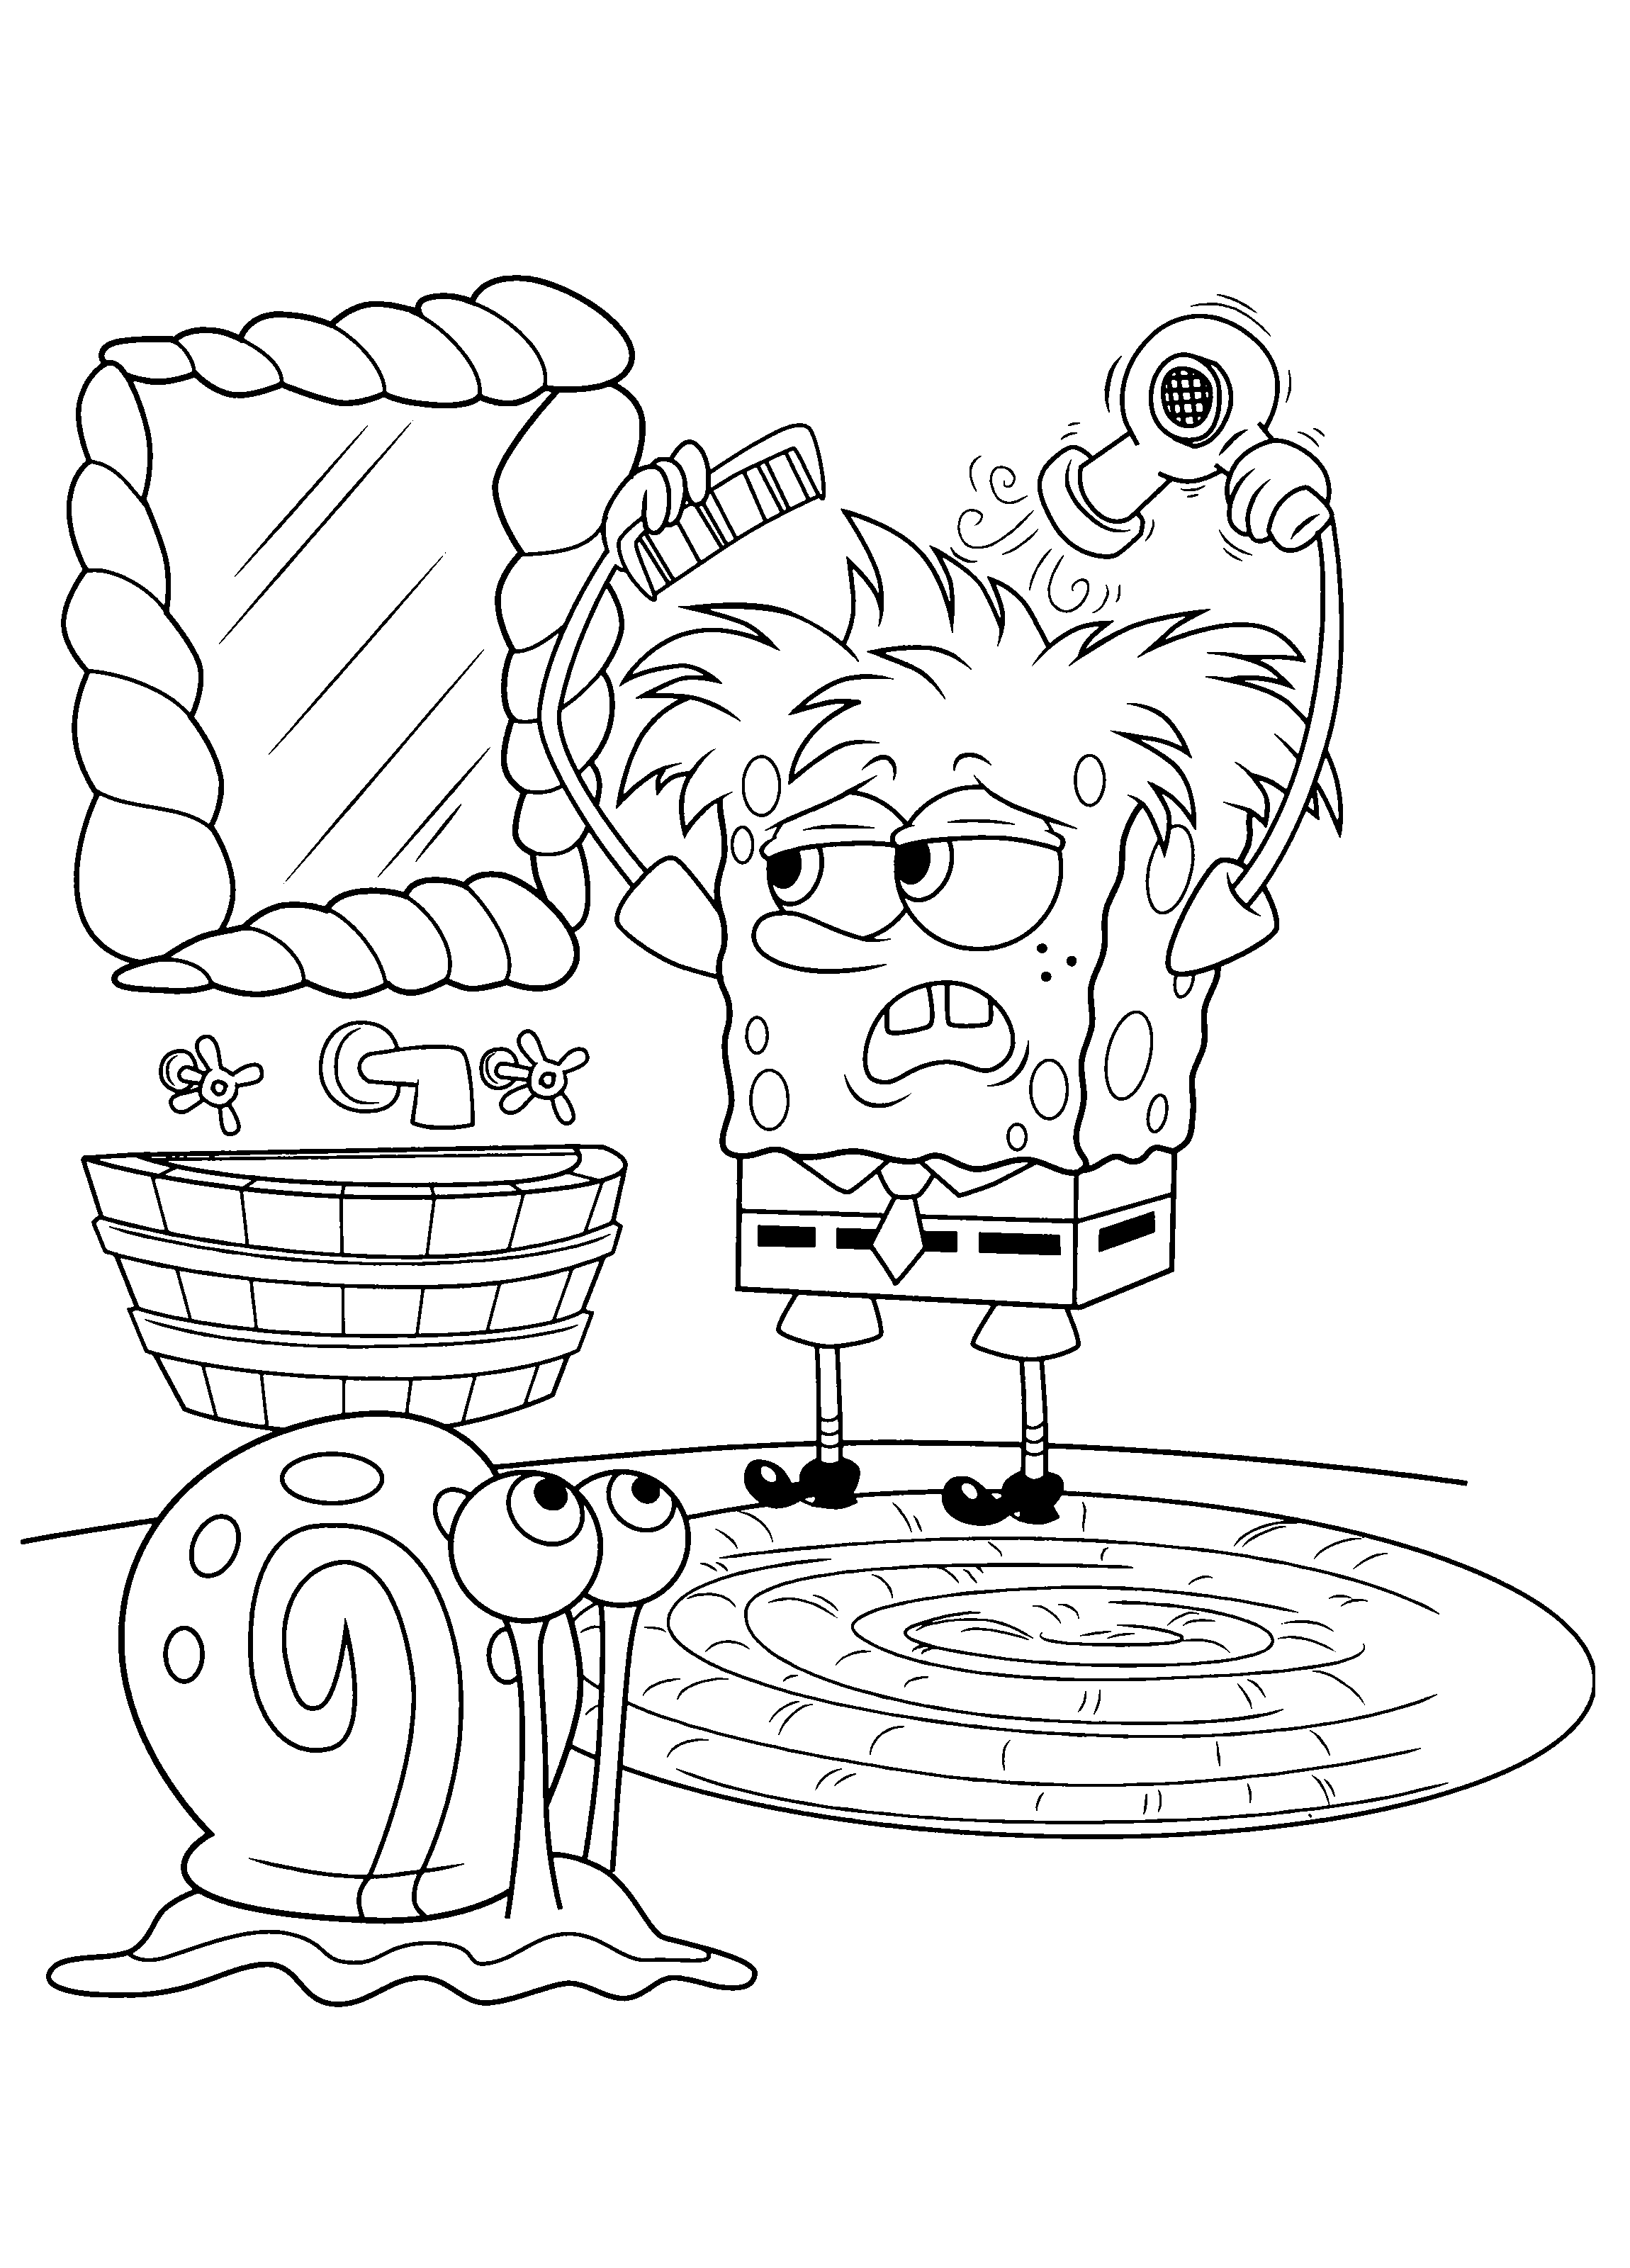 Spongebob Squarepants 04 09 Png 2300 3200 Cartoon Coloring Pages Spongebob Painting Coloring Books